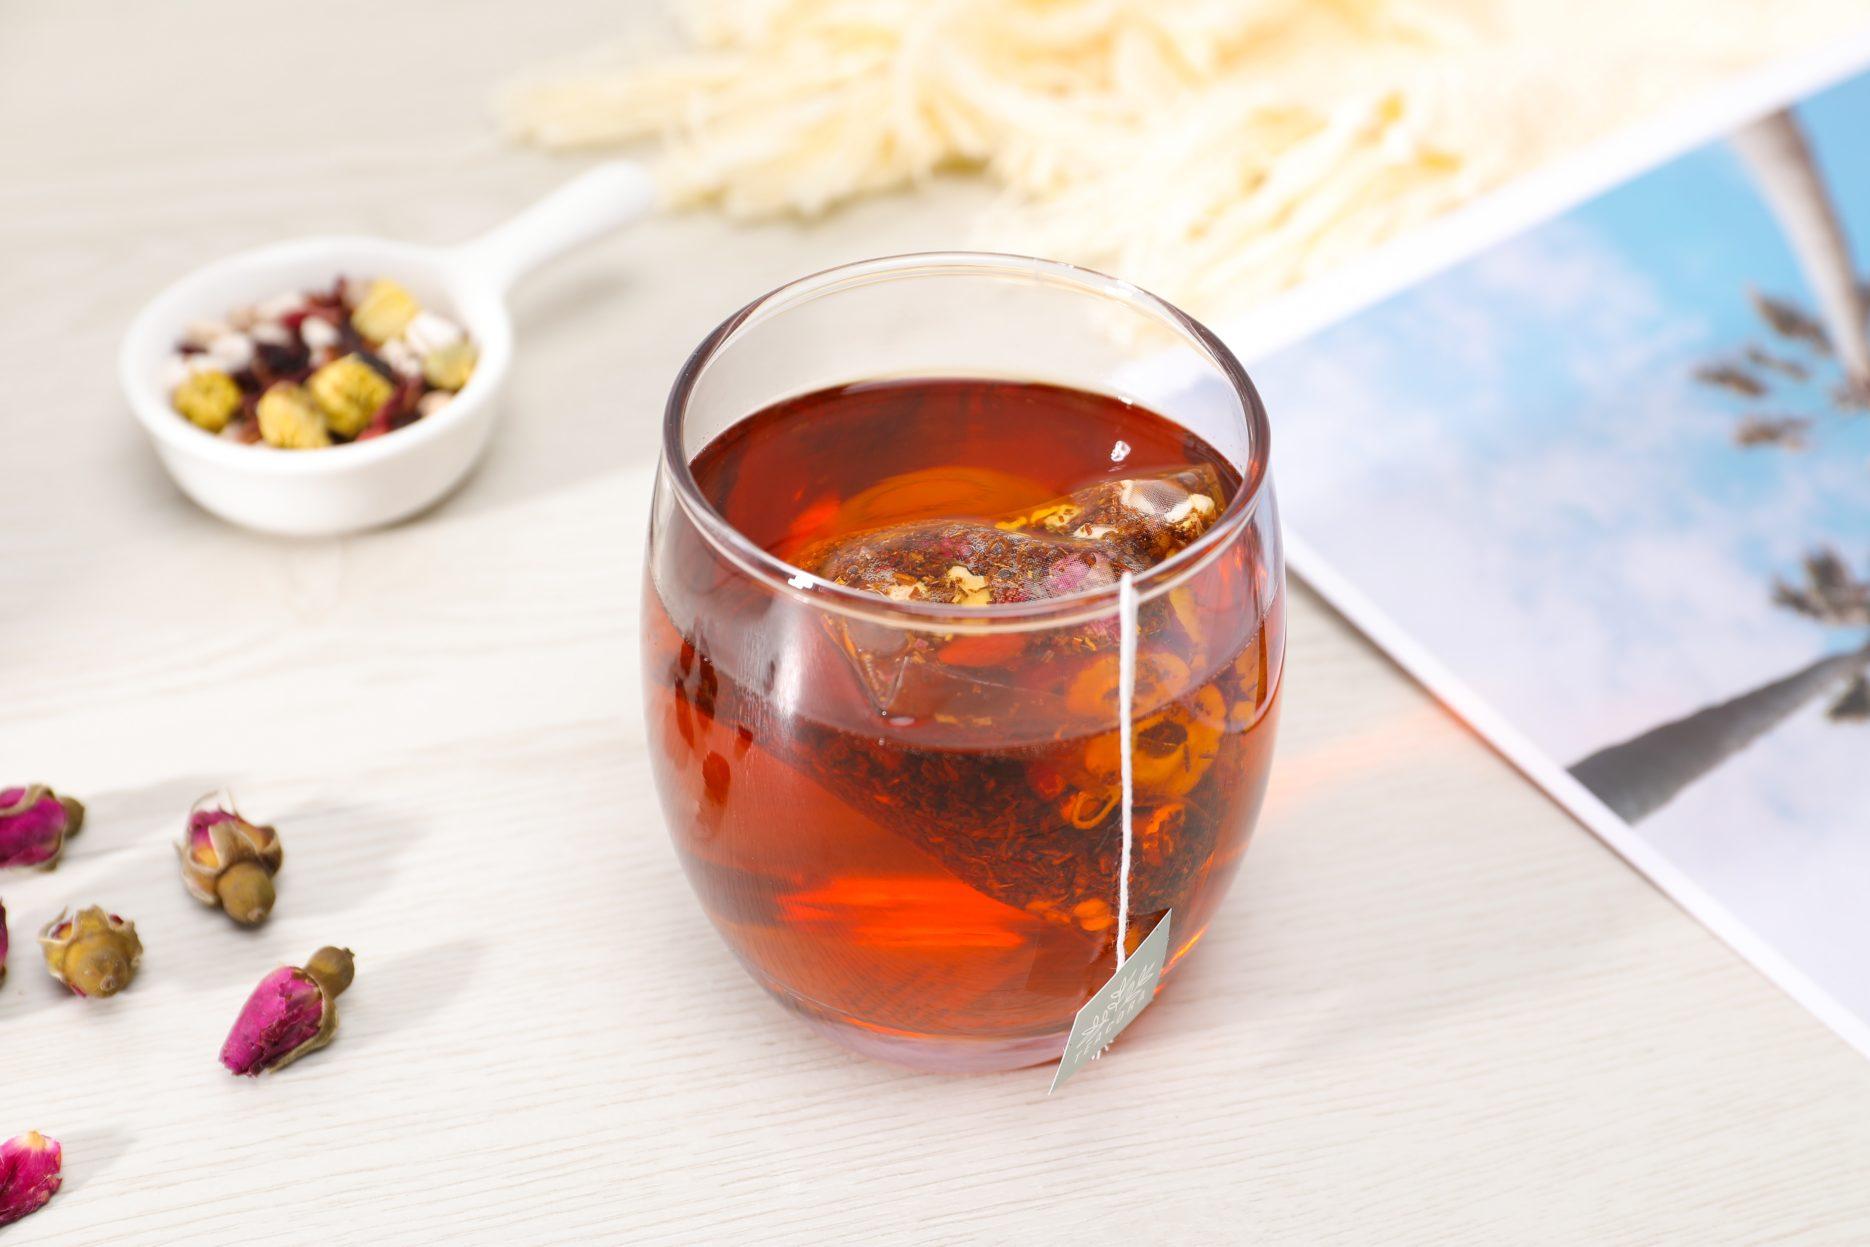 Teabag in mug. Credit: teacora-rooibos Unsplash